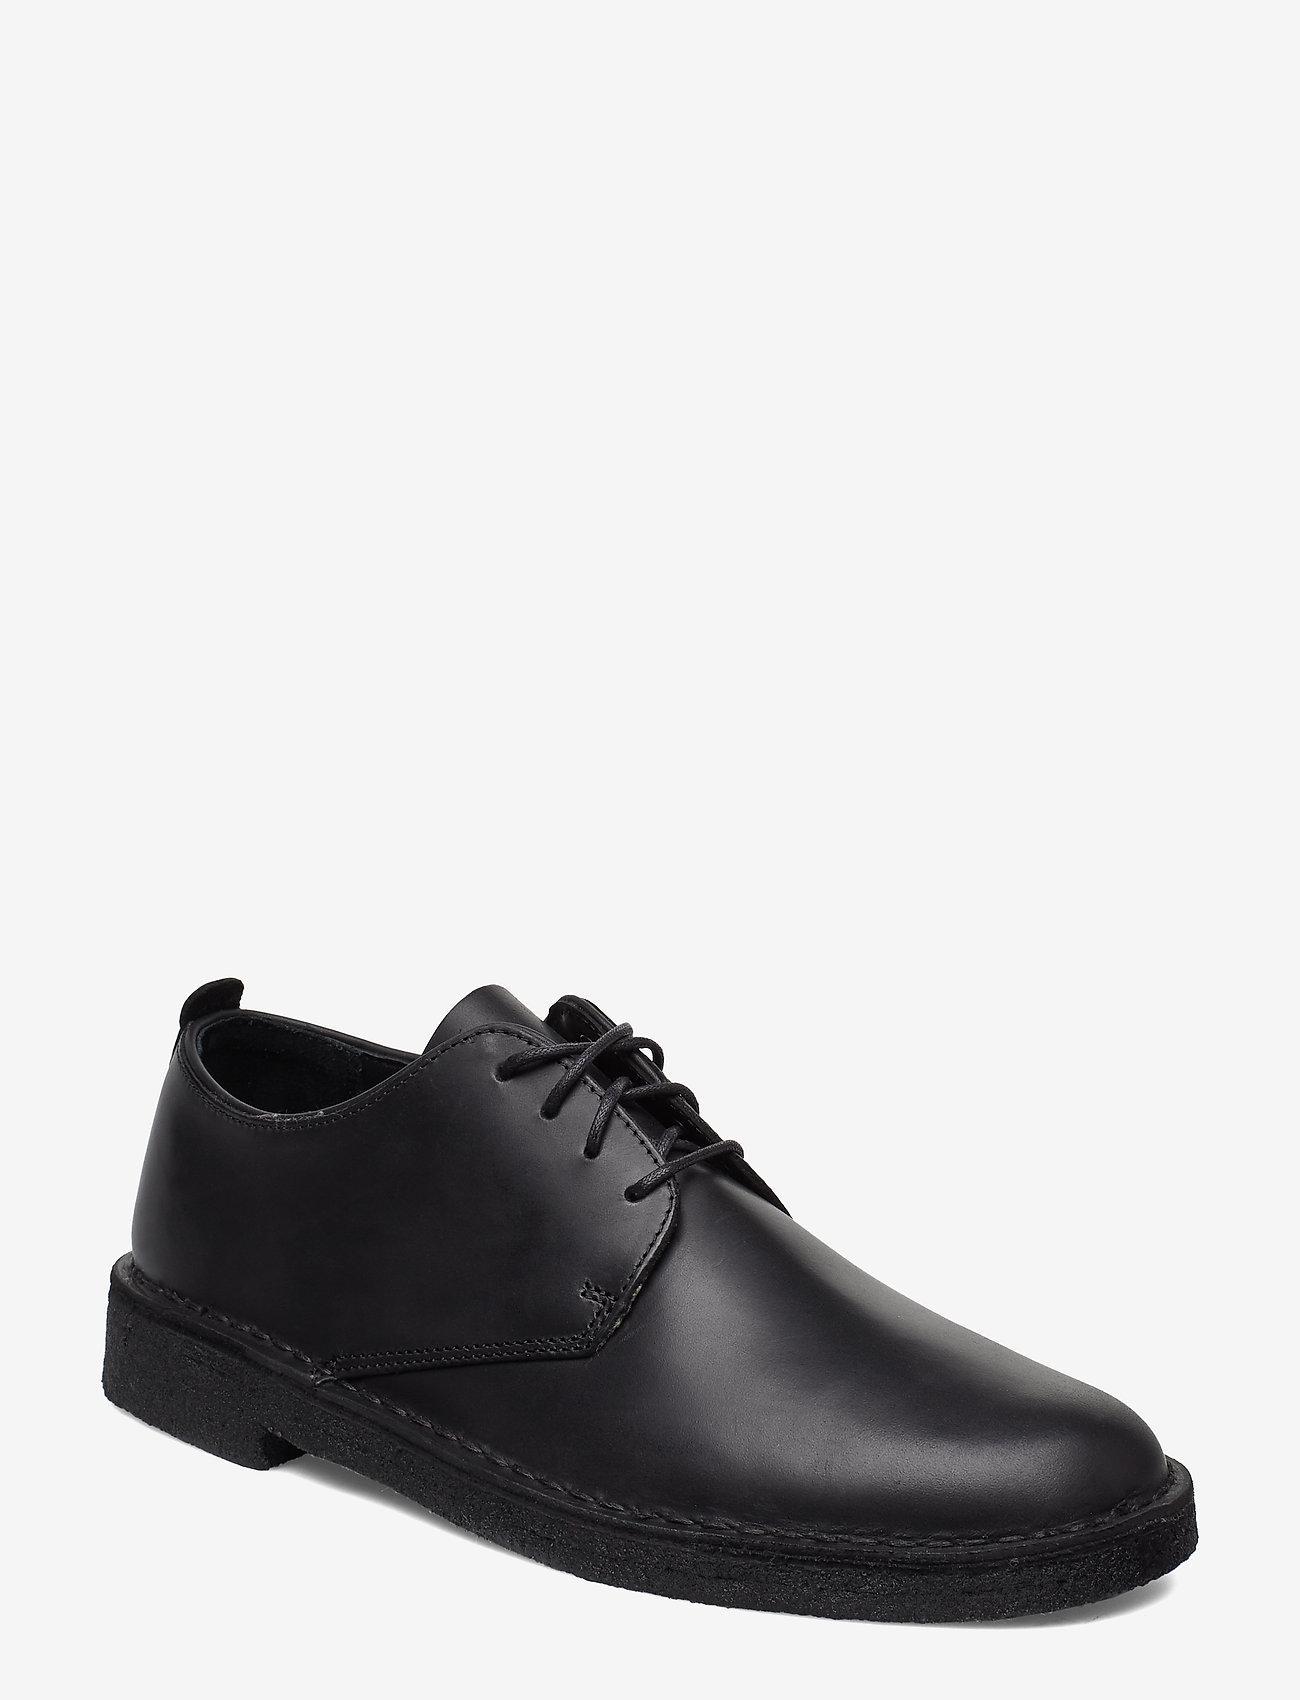 Clarks Originals - Desert London - snörskor - black leather - 0